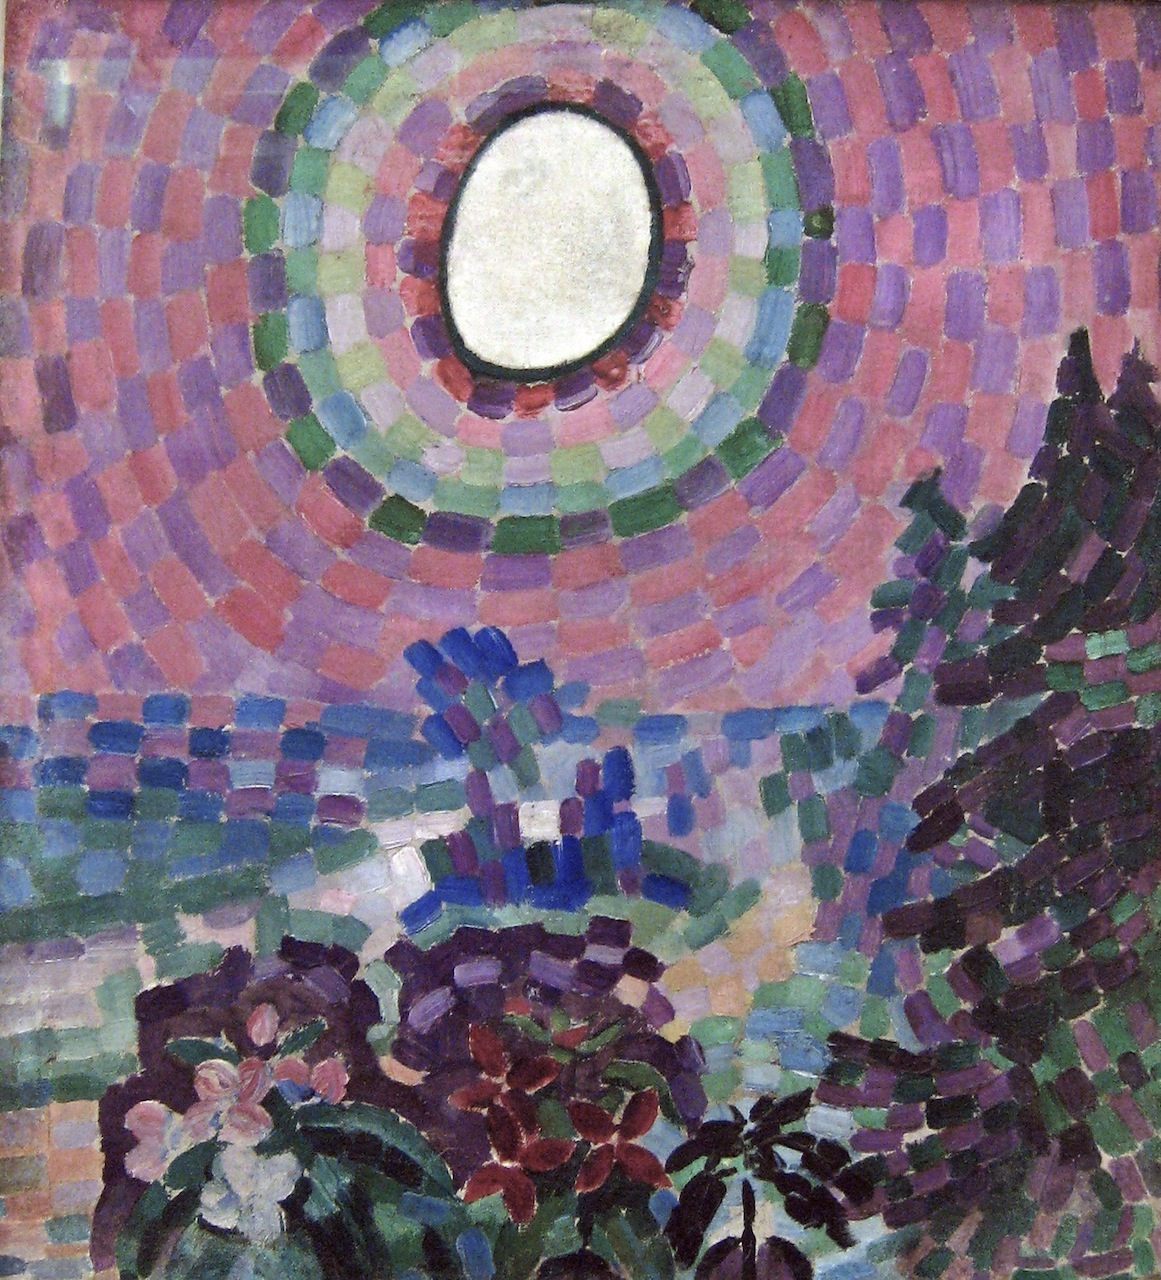 Robert Delaunay. Paysage au disque. 1906. Öl/ Leinwand